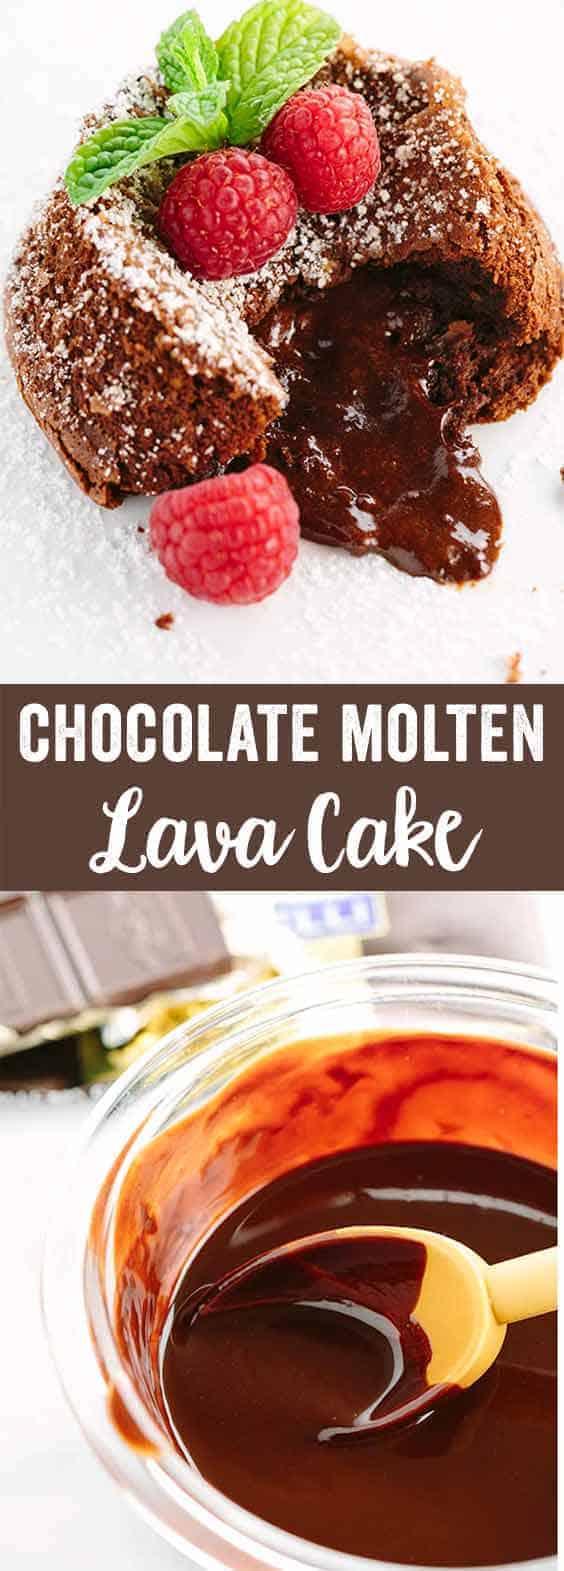 Classic Chocolate Molten Lava Cake with Raspberries | Jessica Gavin